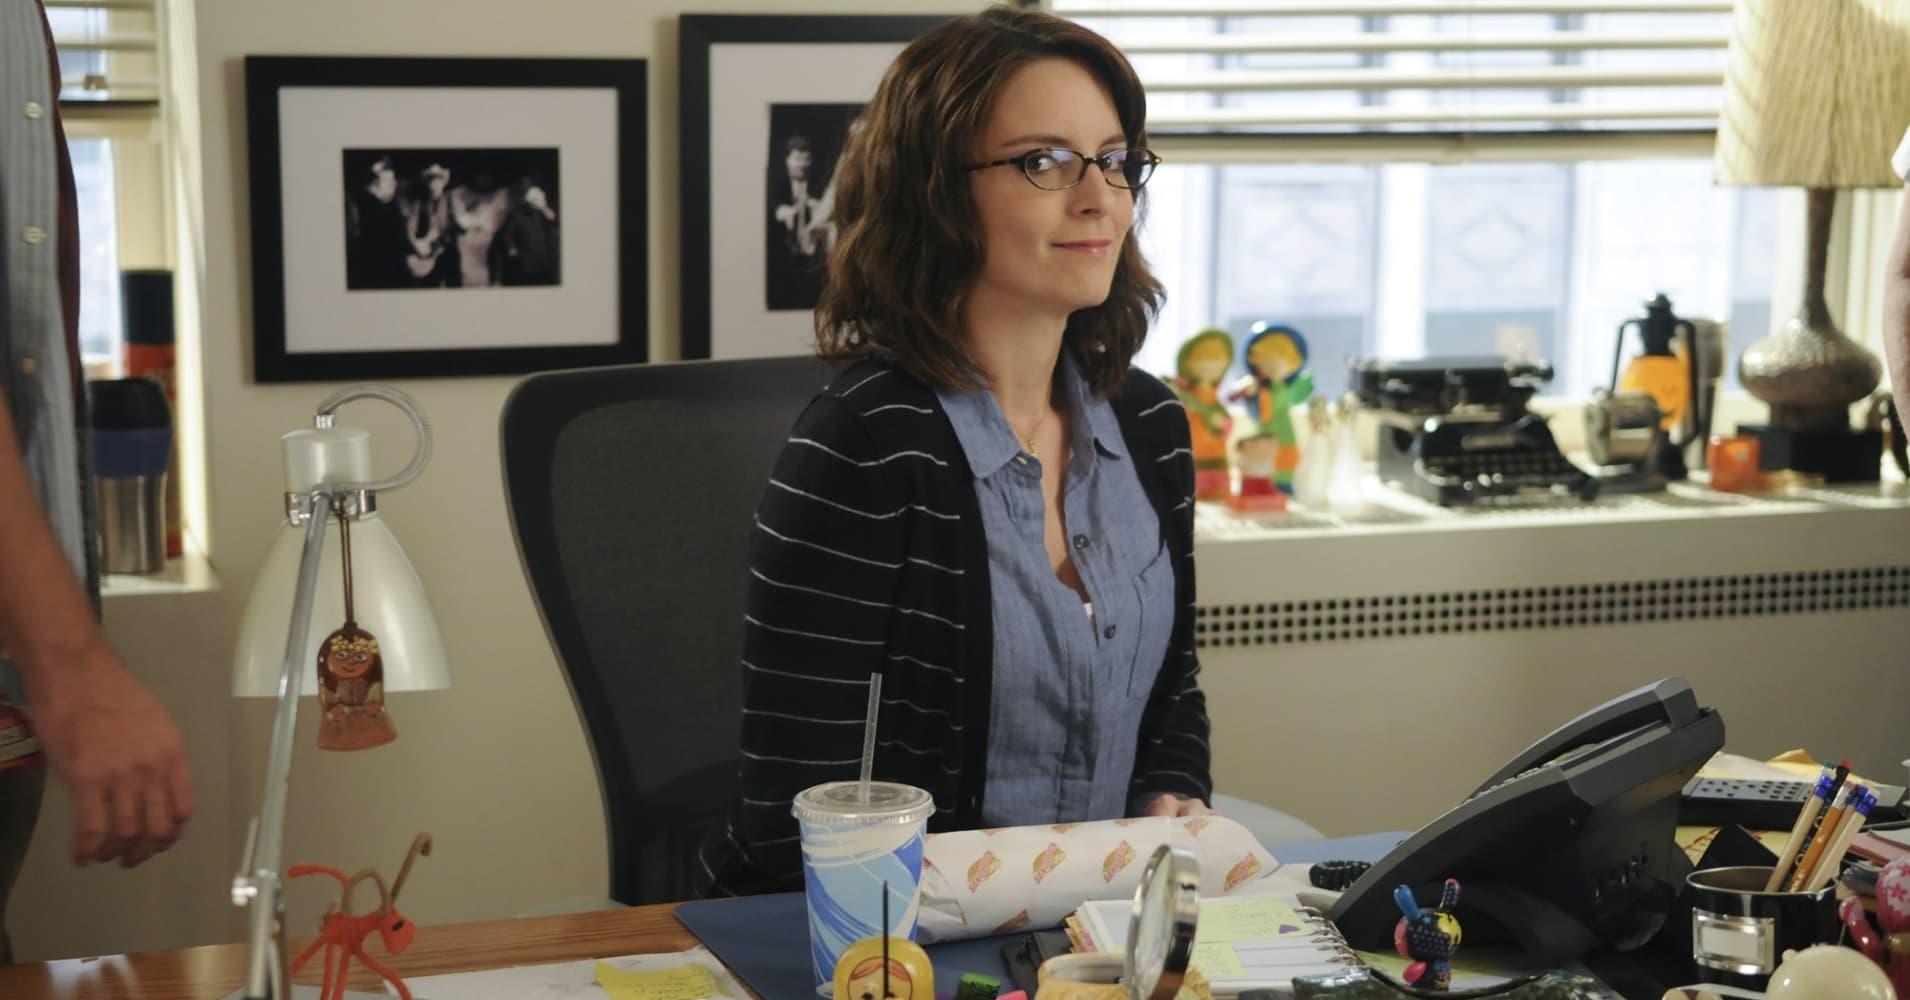 Tina Fey as Liz Lemon on 30 Rock